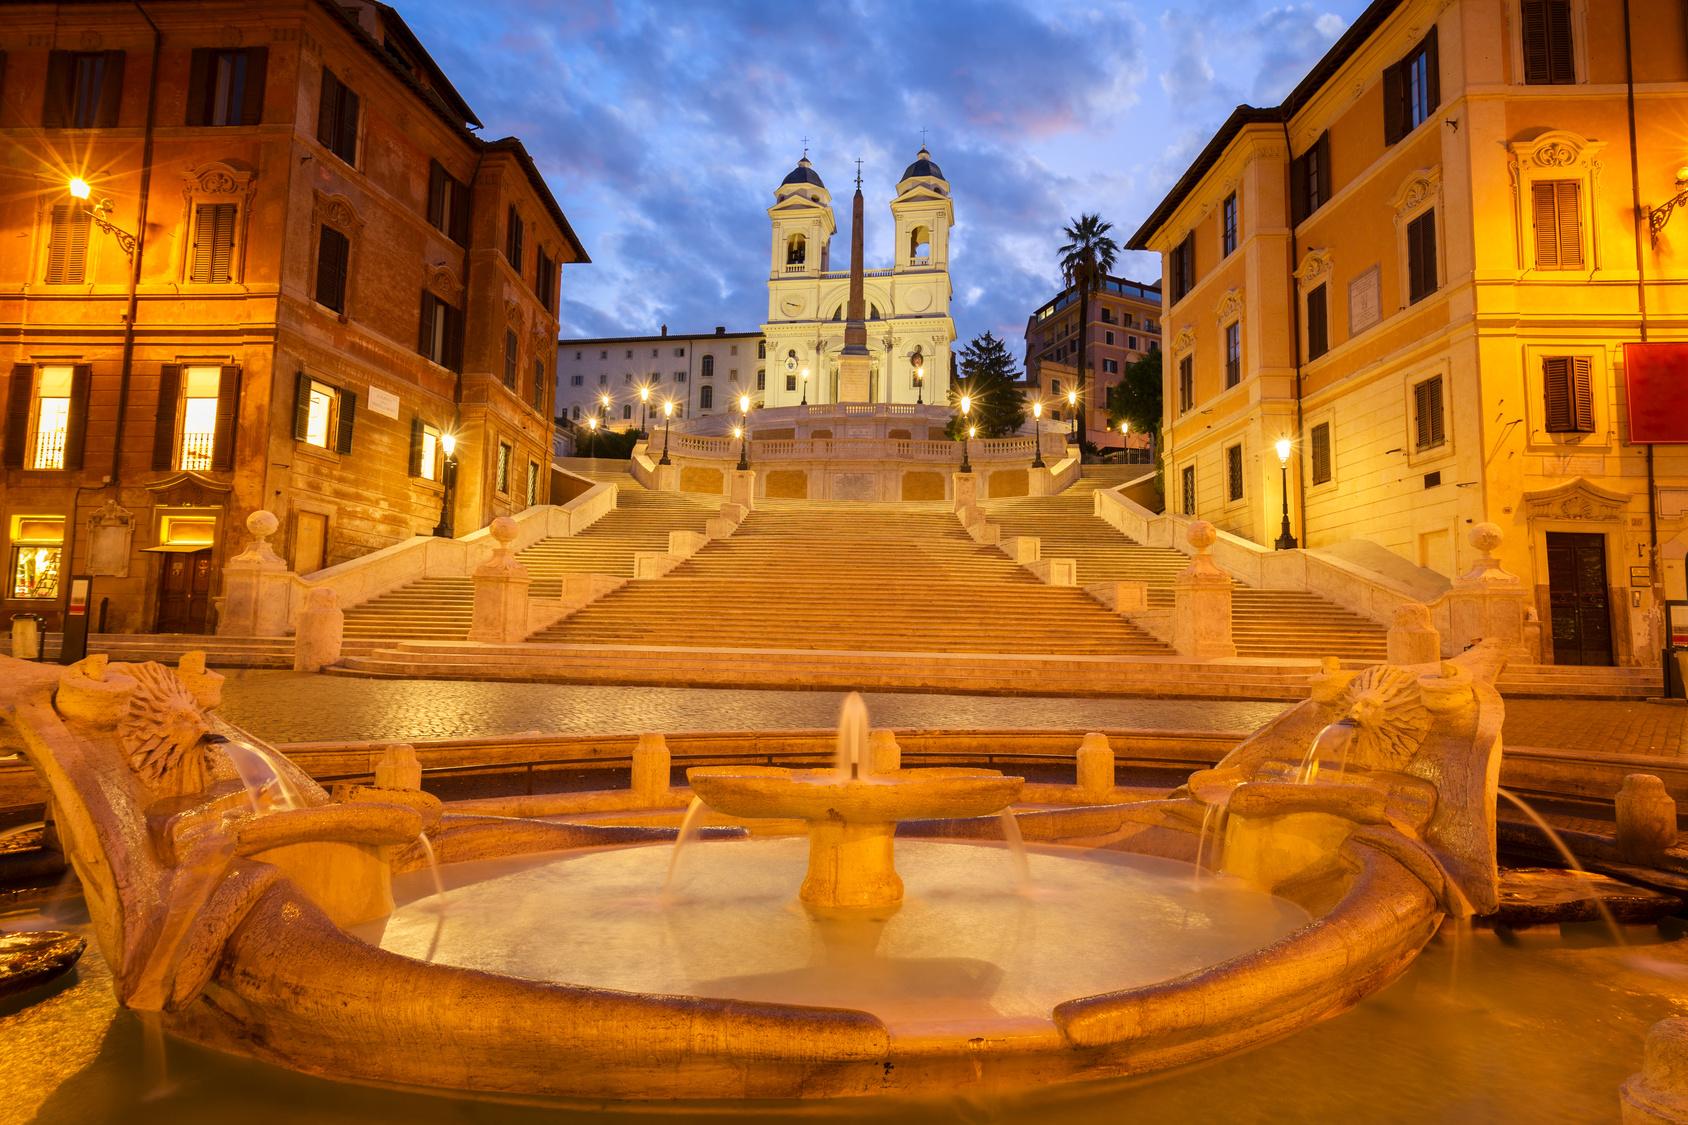 Die Spanische Treppe In Rom Fe Reisetouristik